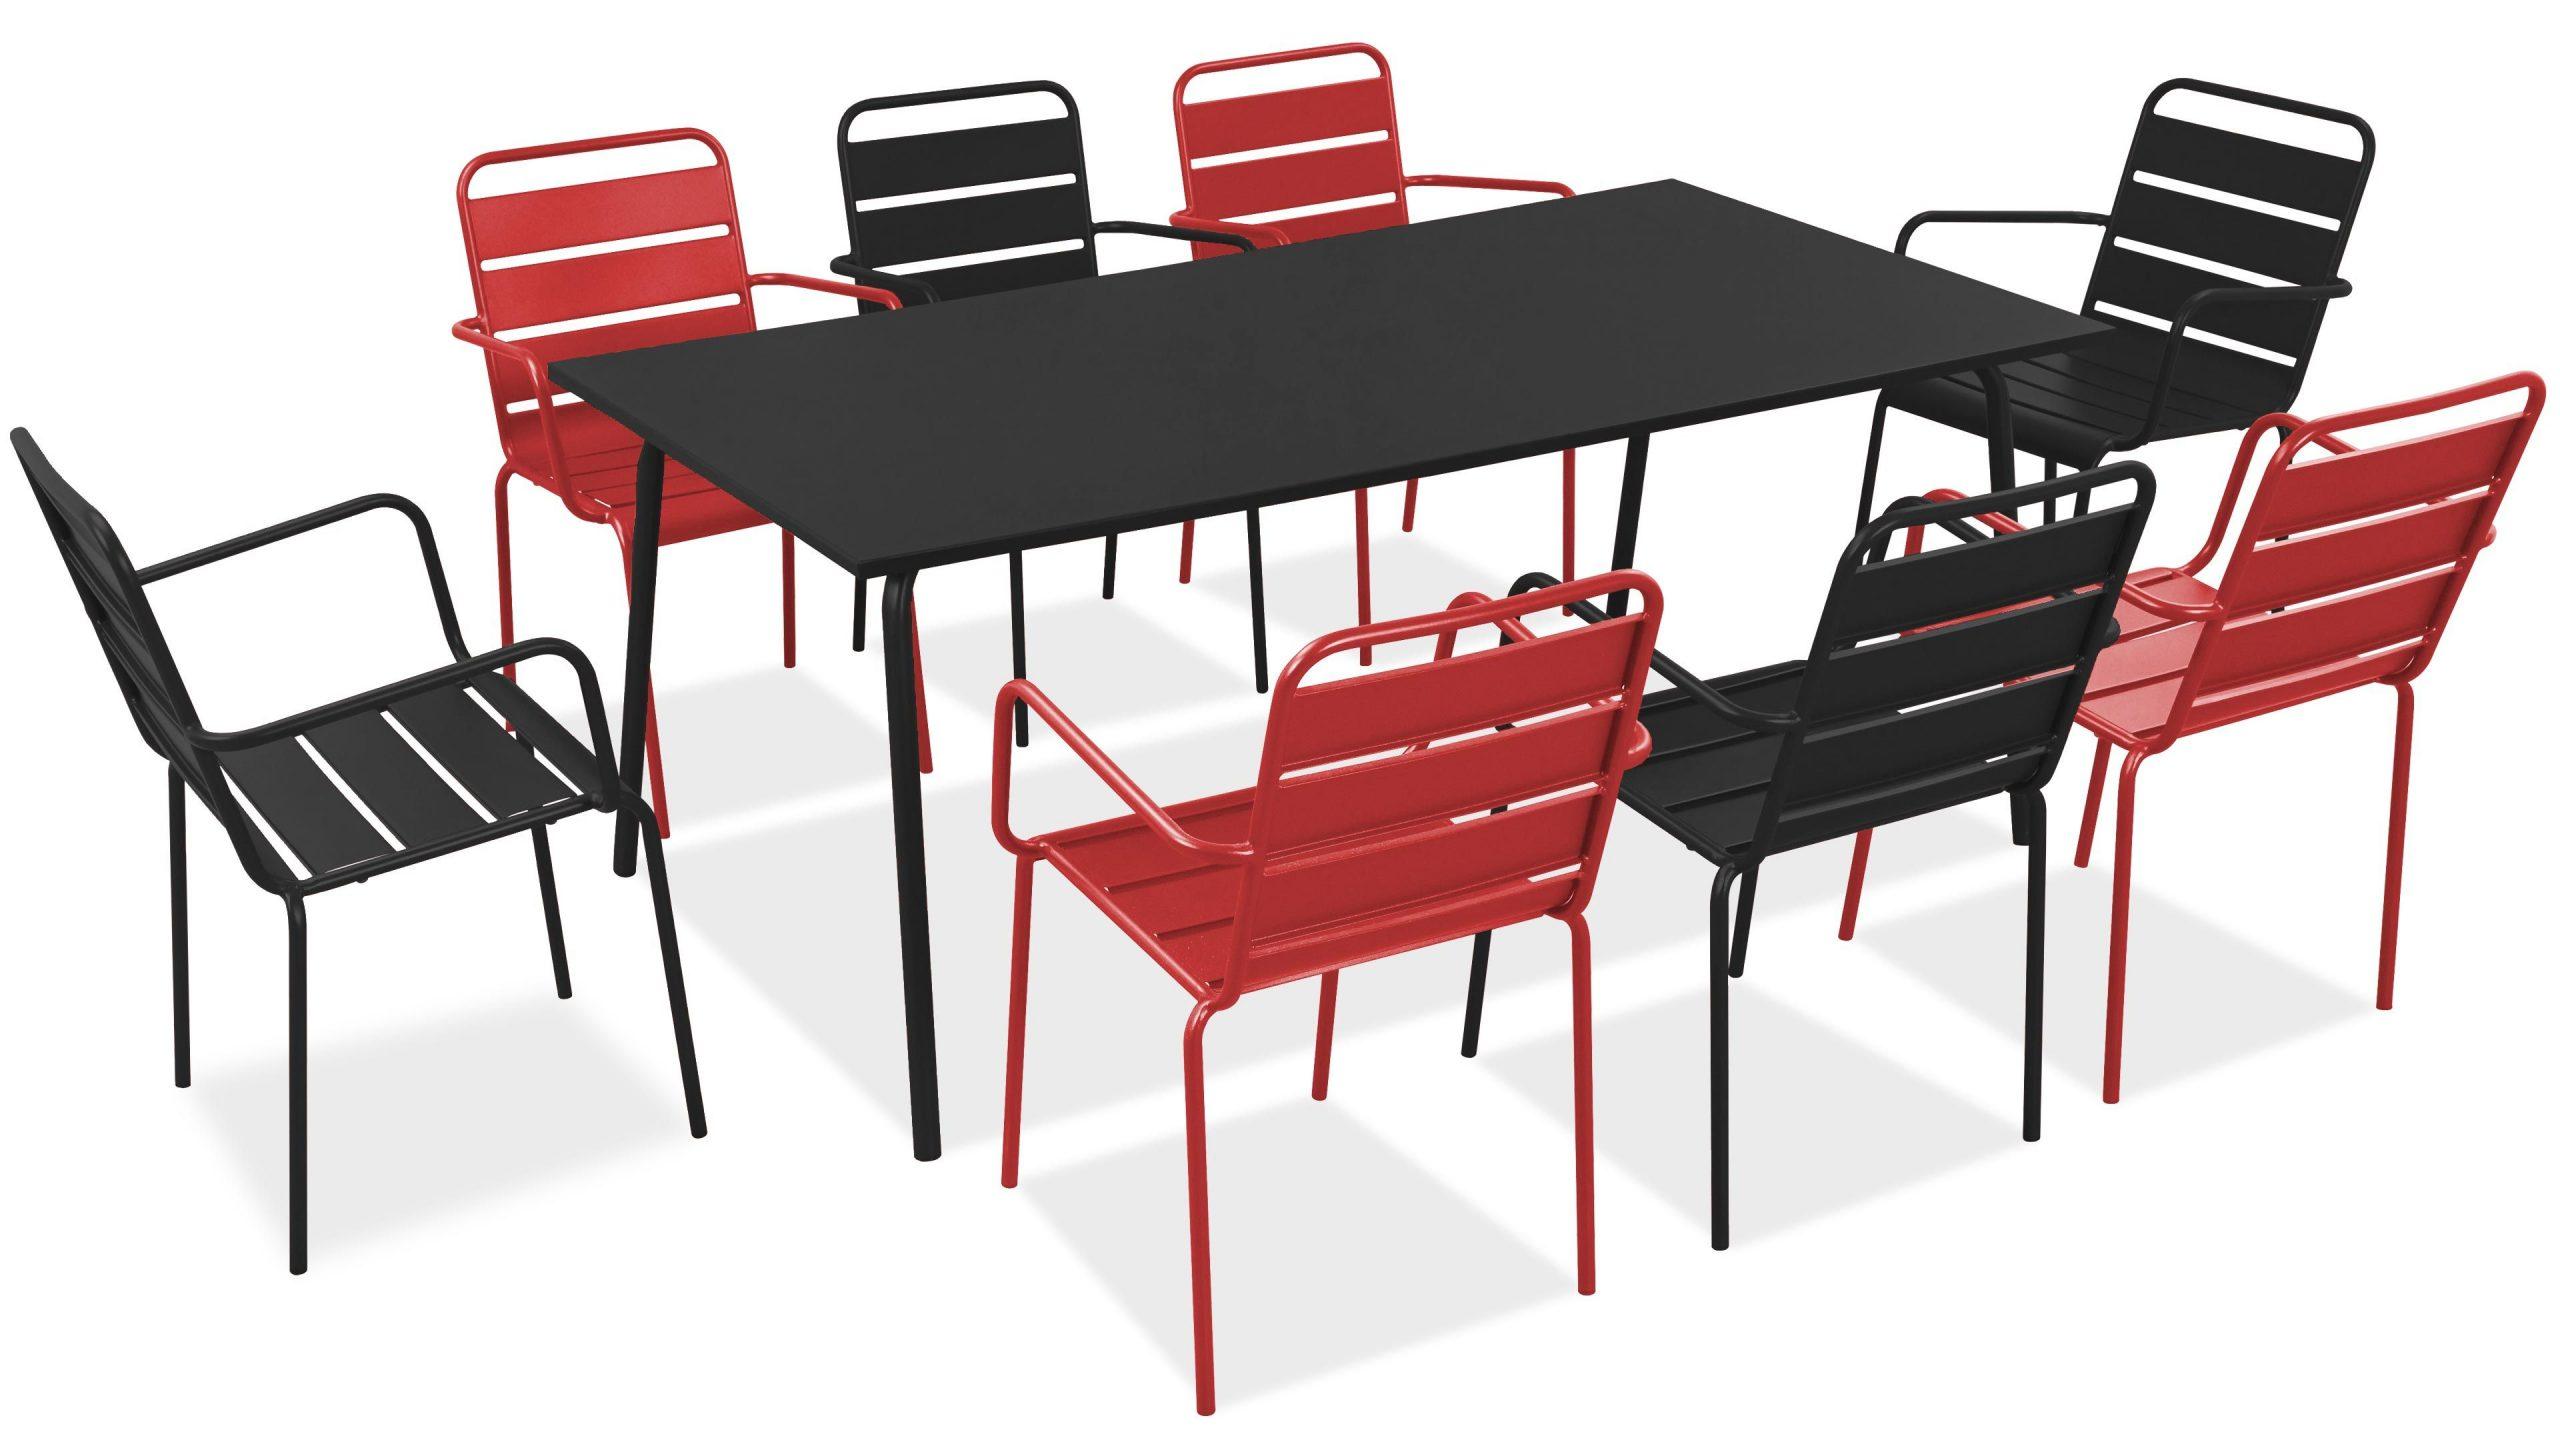 Salon De Jardin Metal Table Et Fauteuils intérieur Salon De Jardin Rouge